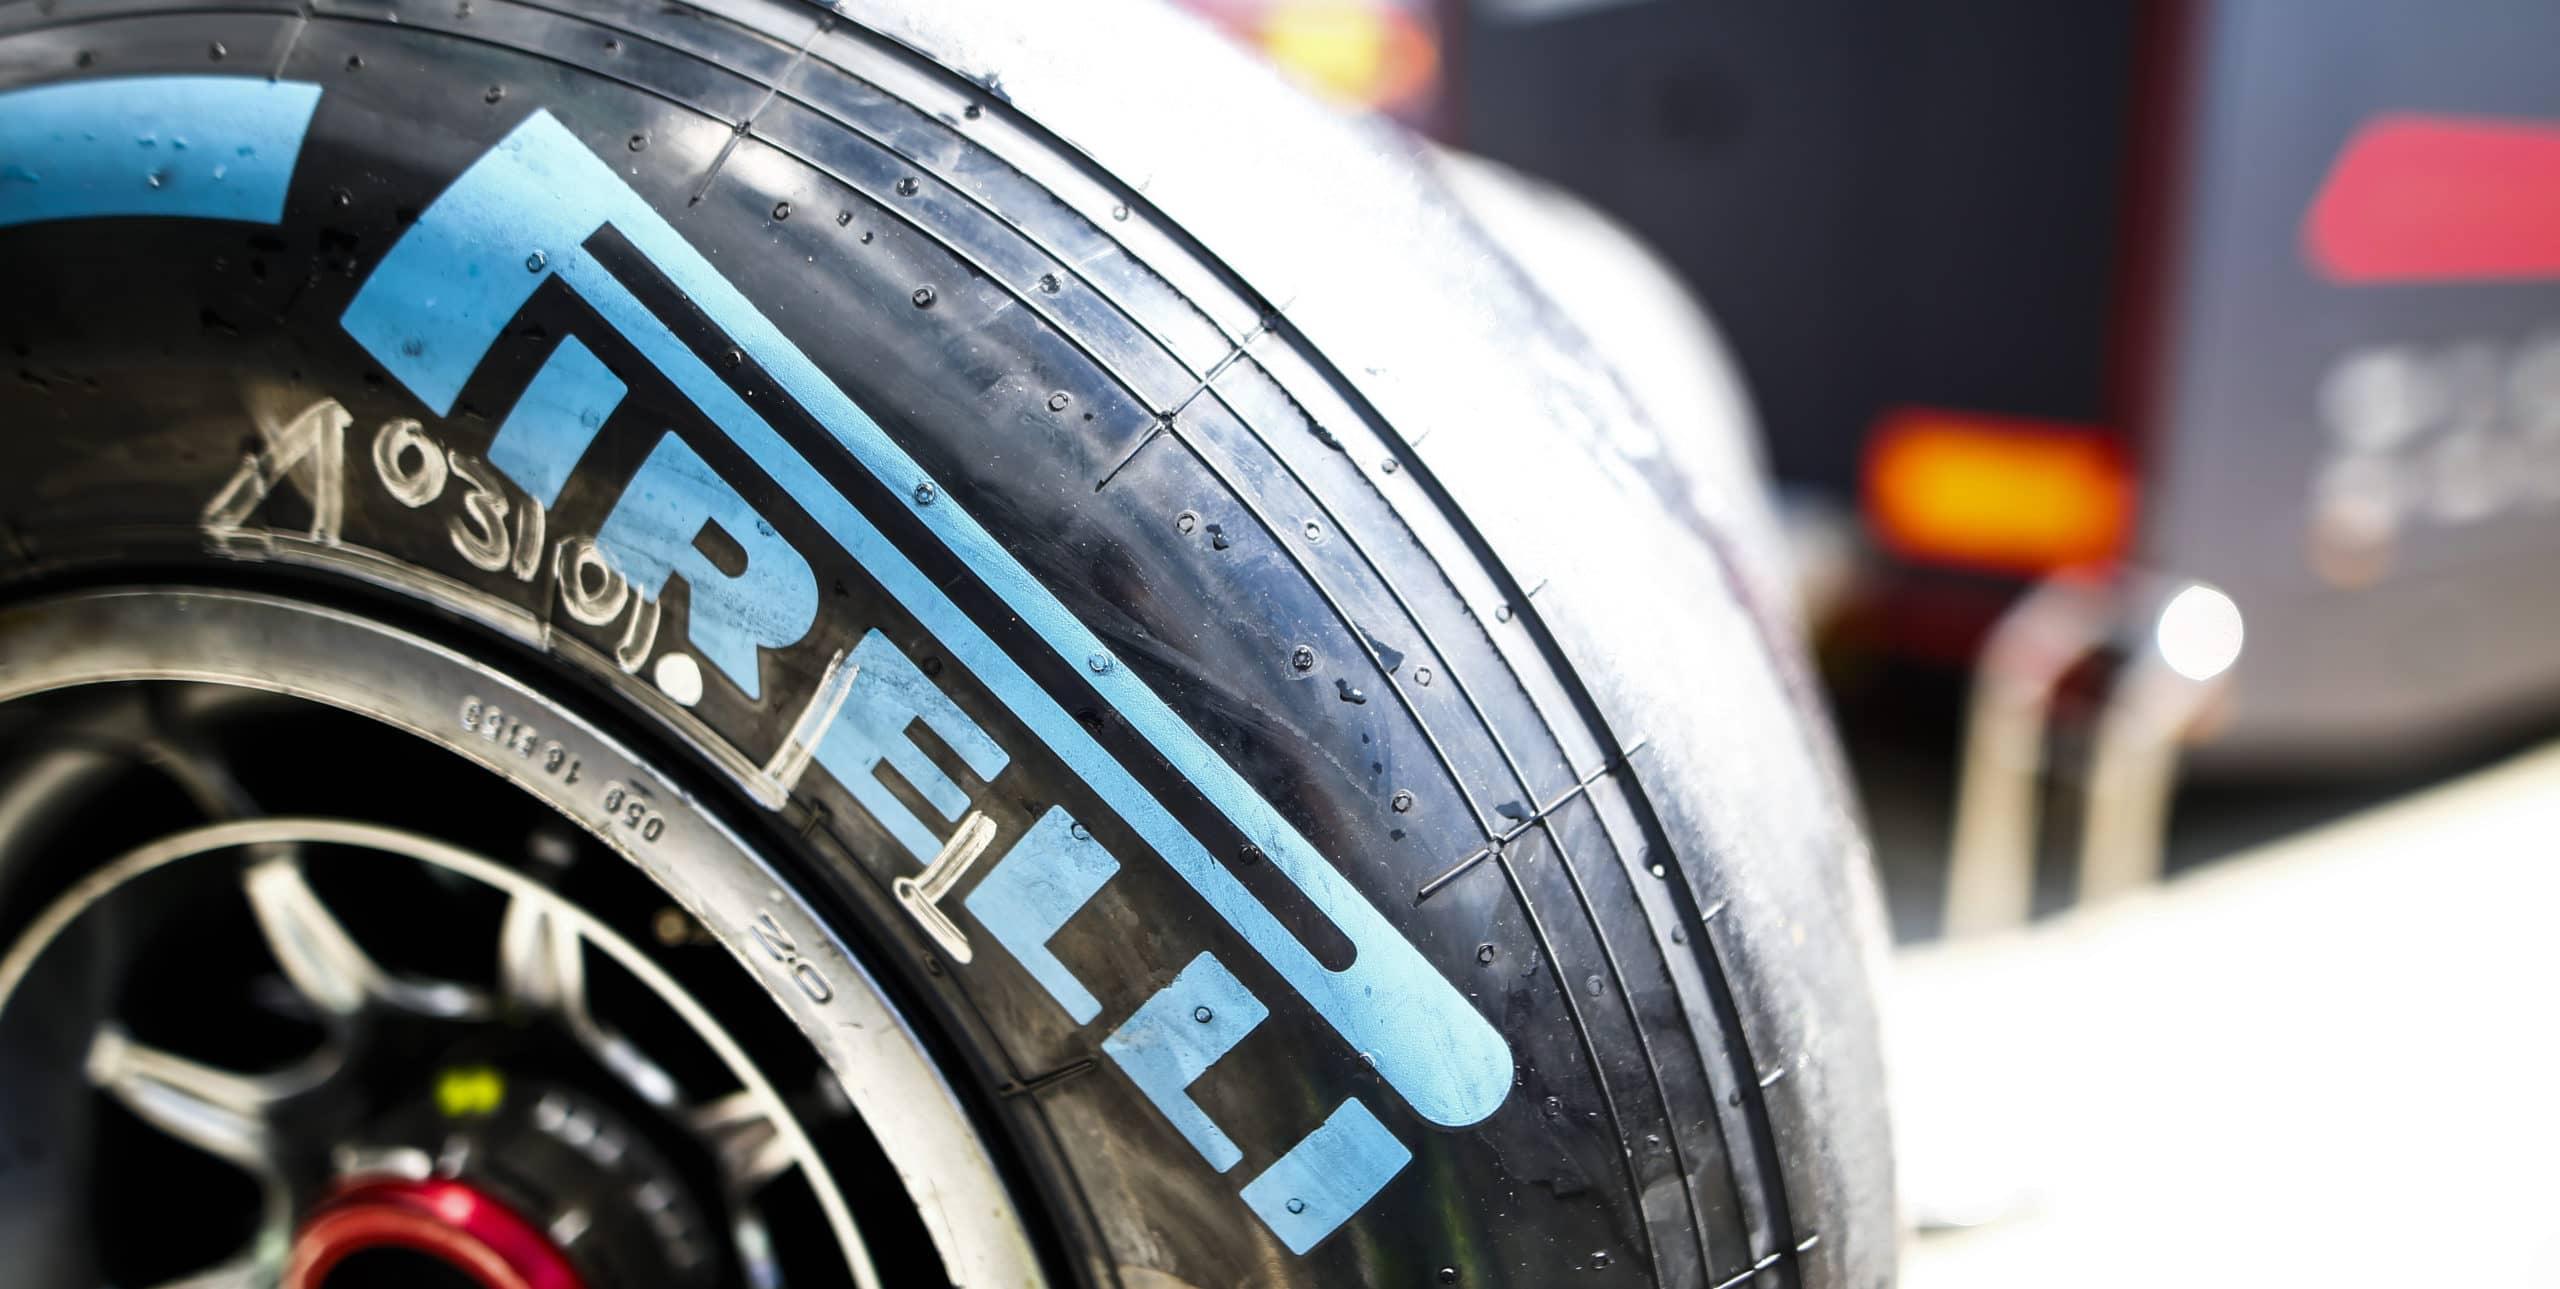 2018 British Grand Prix, gomma extra hard.